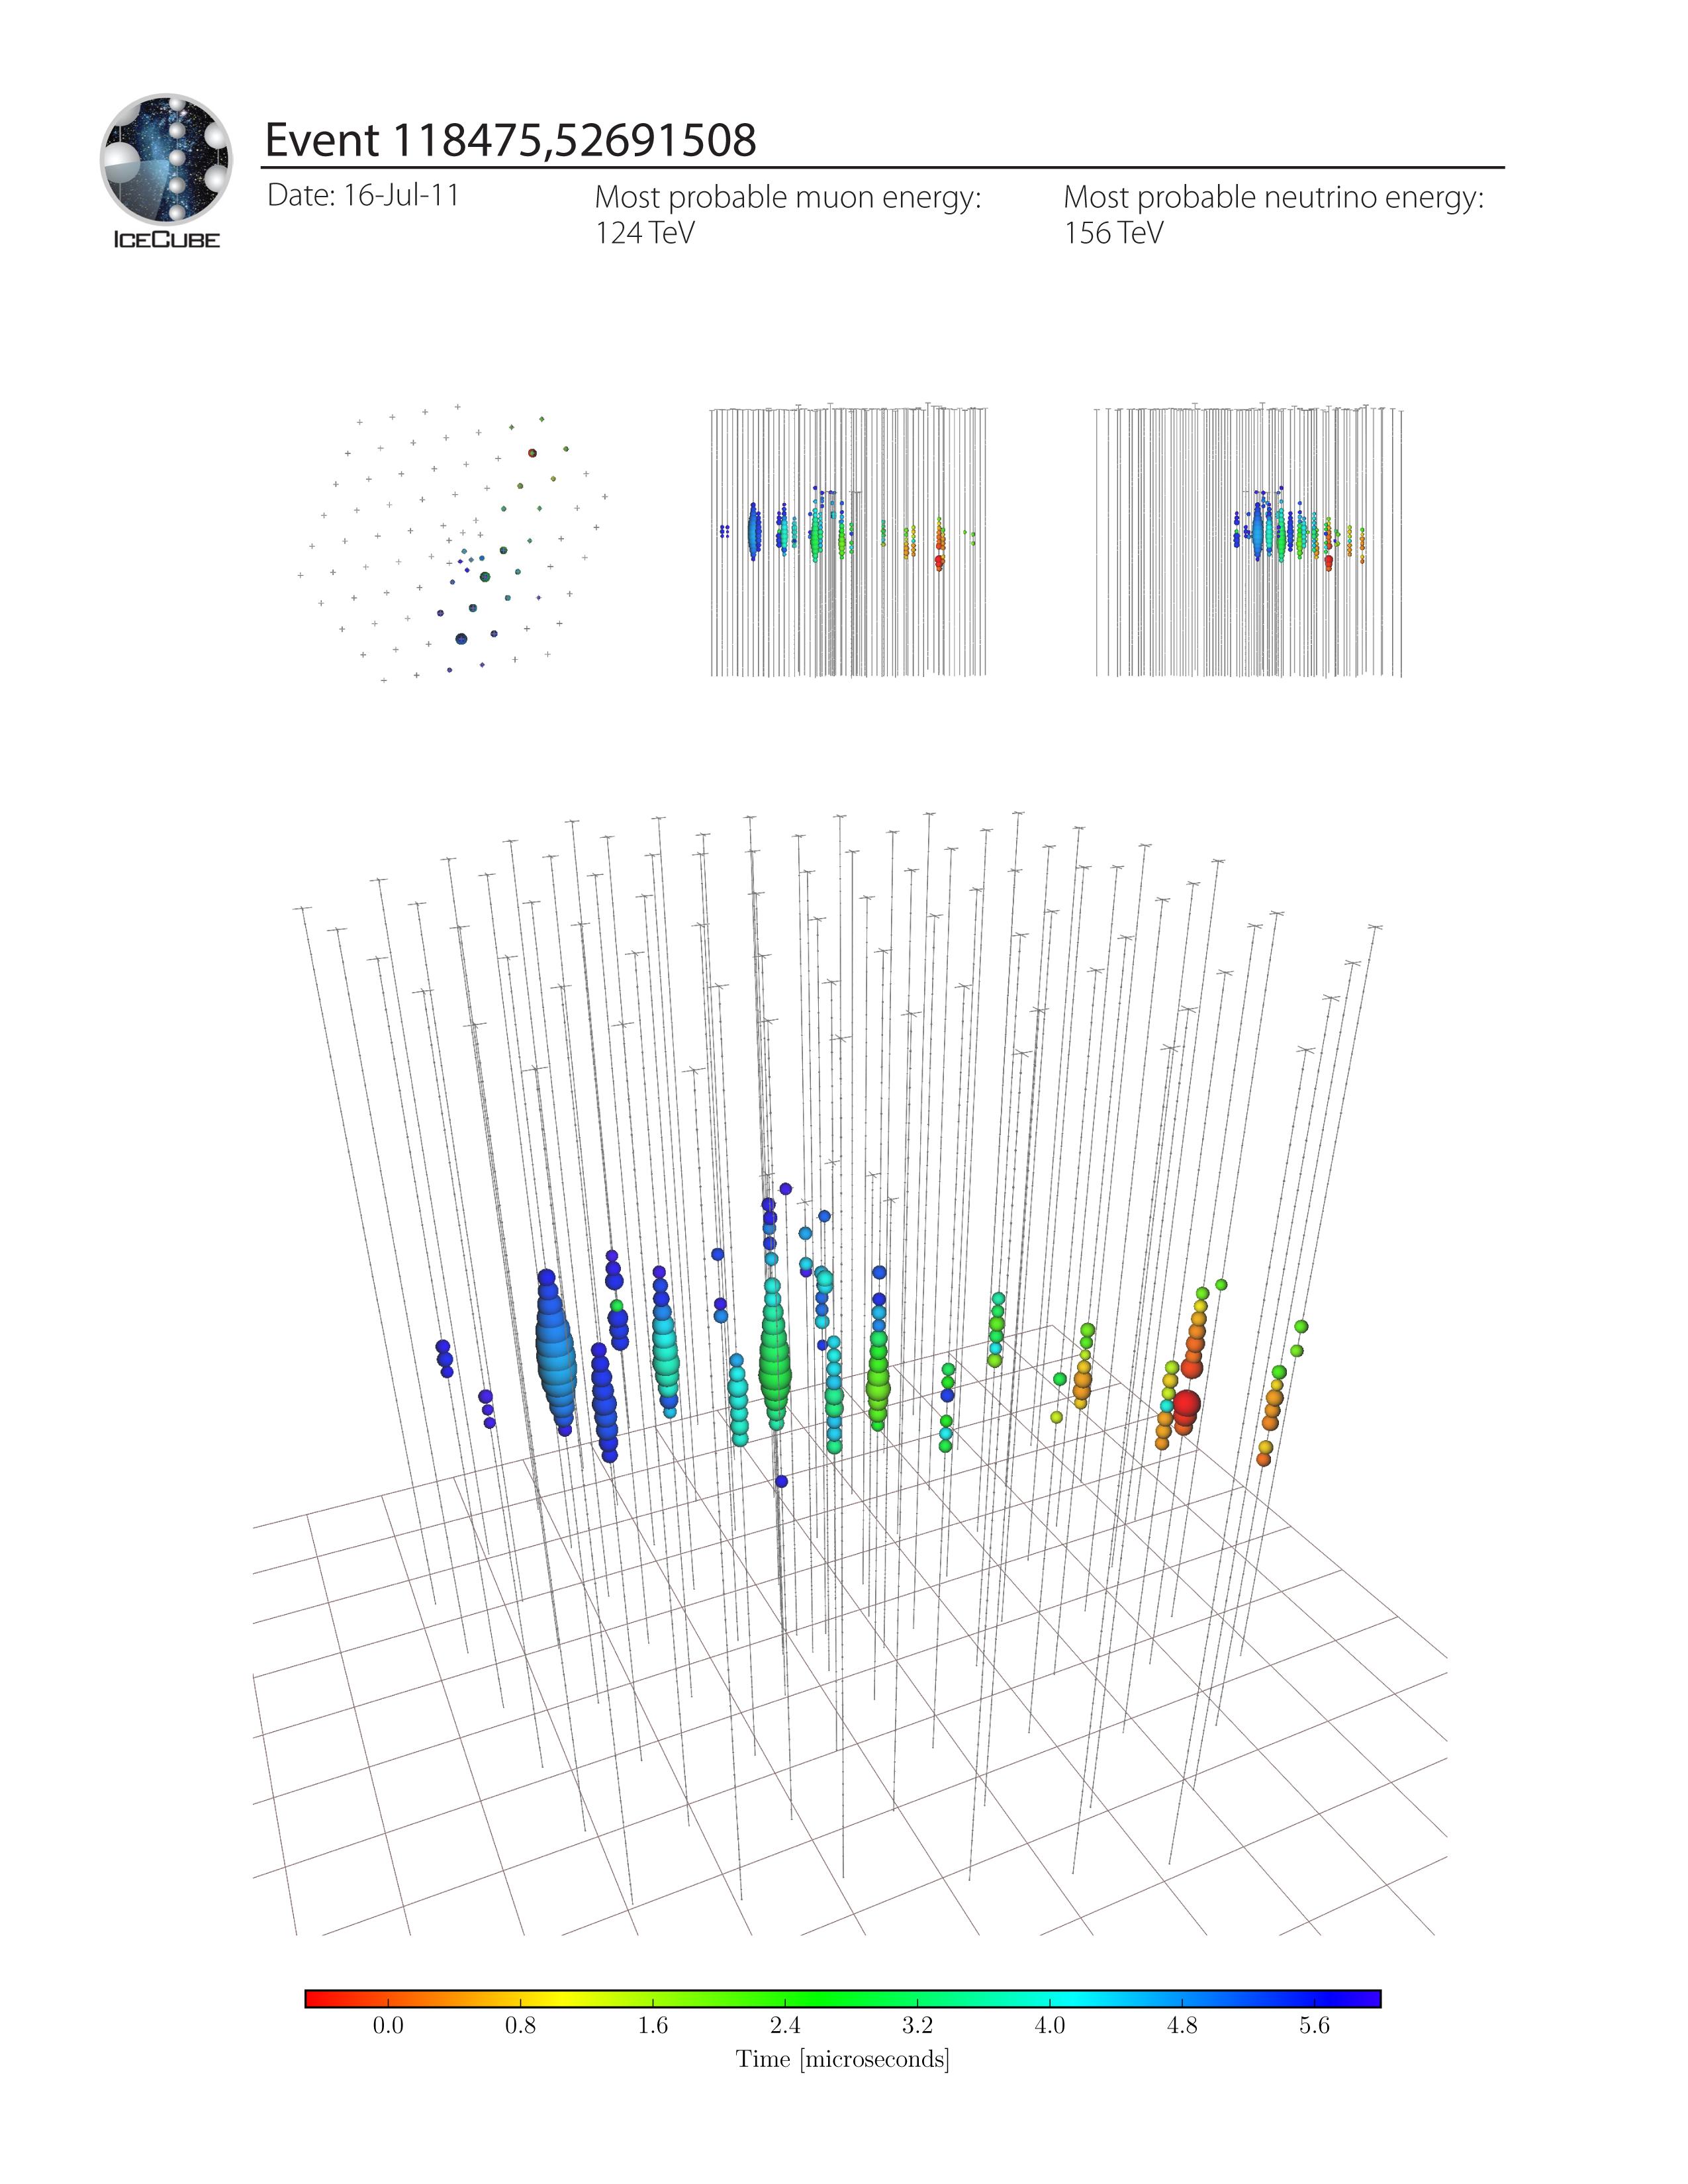 IceCube Event ID 118475,52691508. Most probable neutrino energy: 156 TeV, July 26, 2011